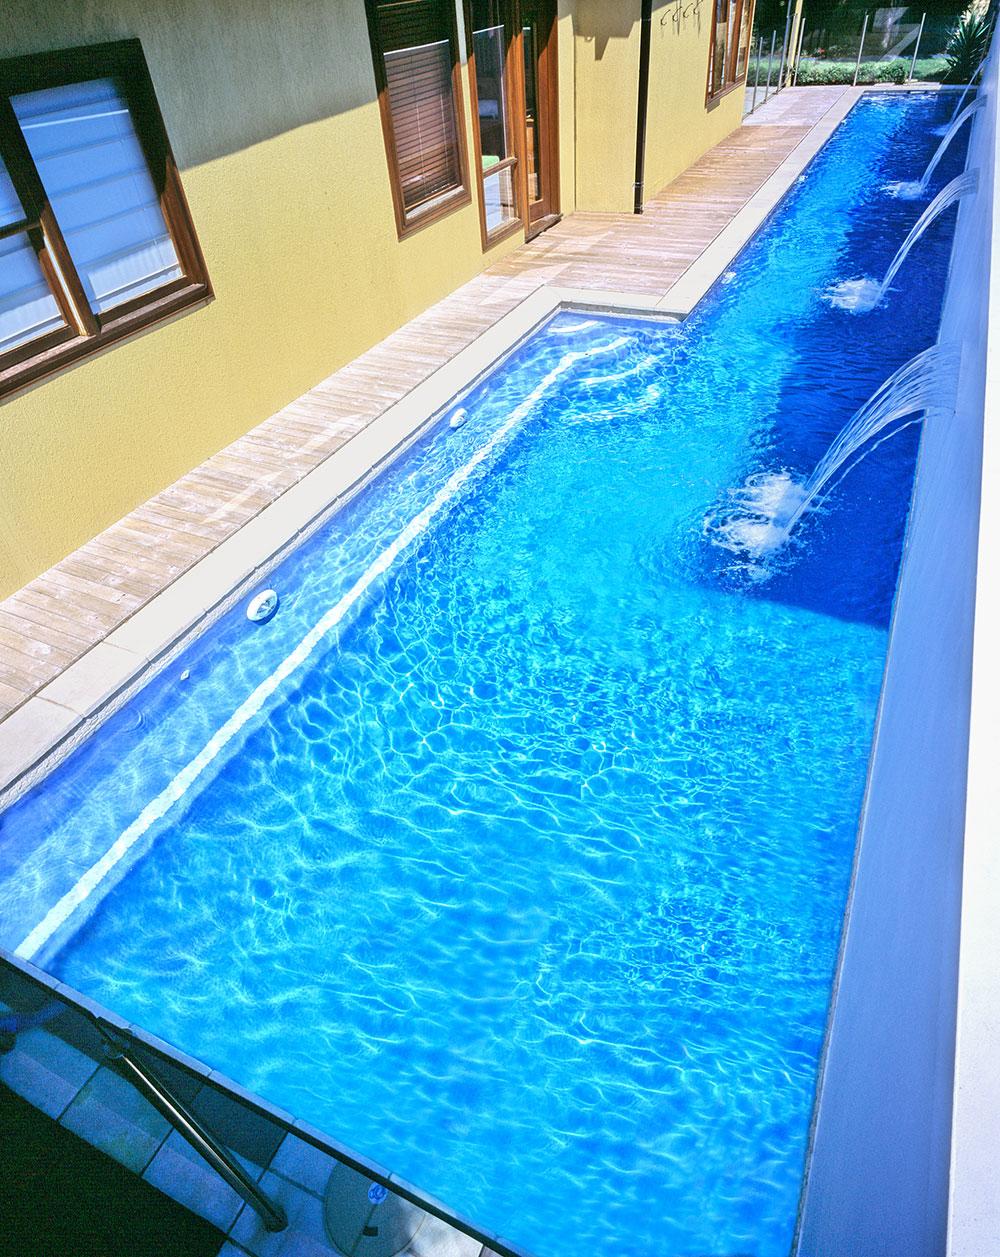 Swimming Pool Designs Inspiration - 88